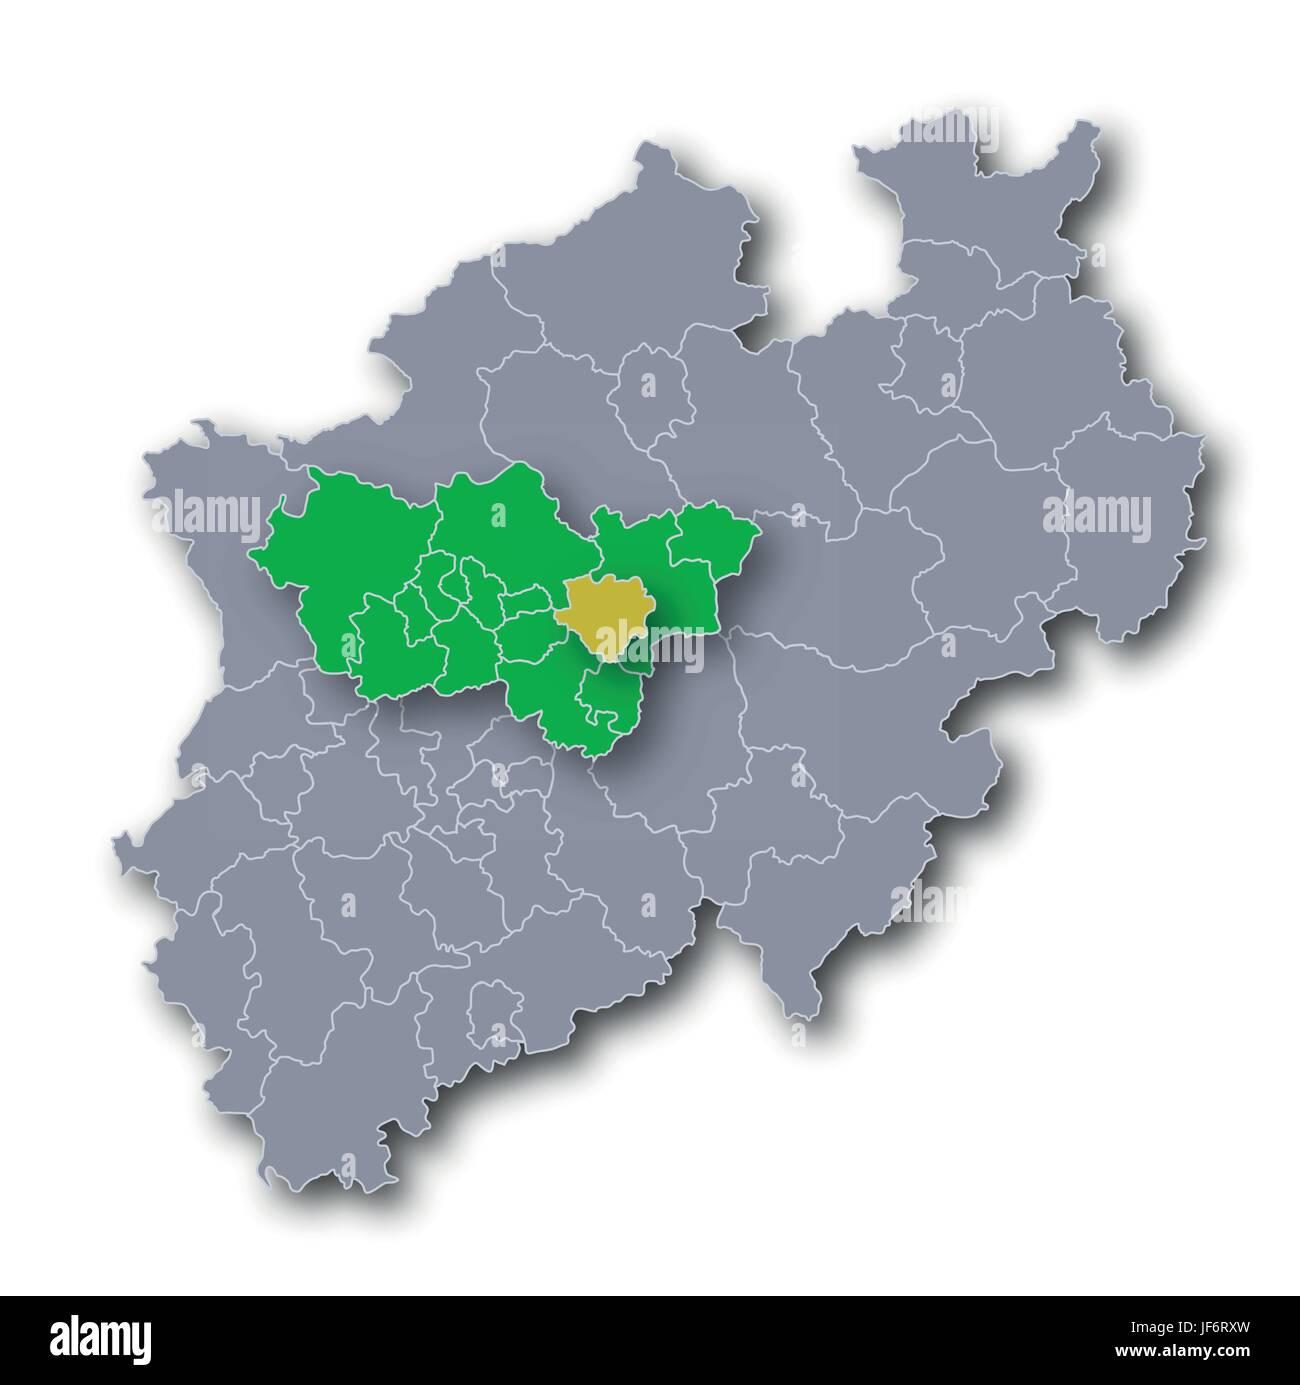 city, town, metropolis, card, urban area, westphalia, proud, pride, city, town, - Stock Image